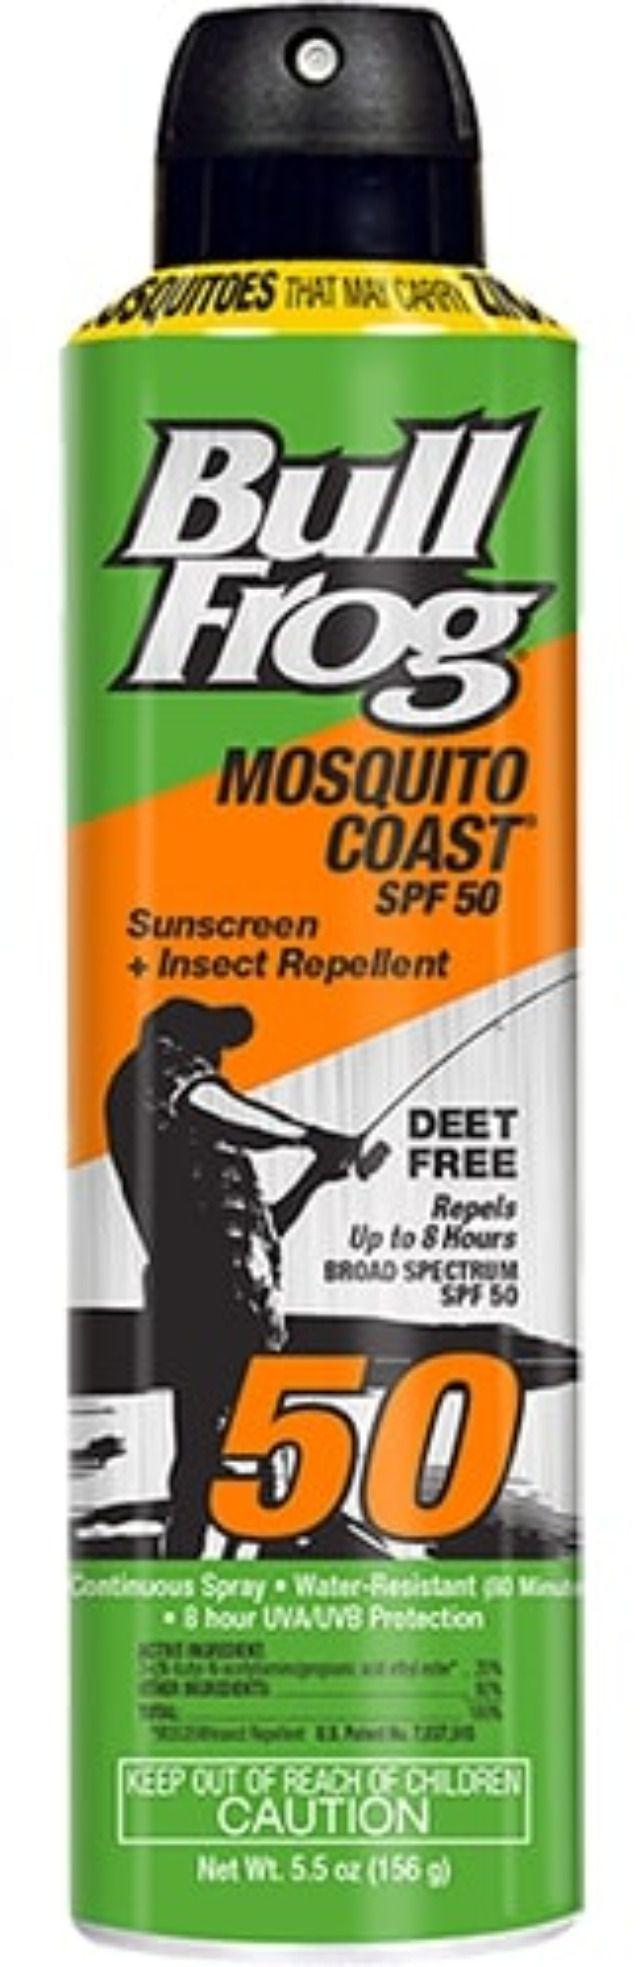 Bullfrog Mosquito Coast